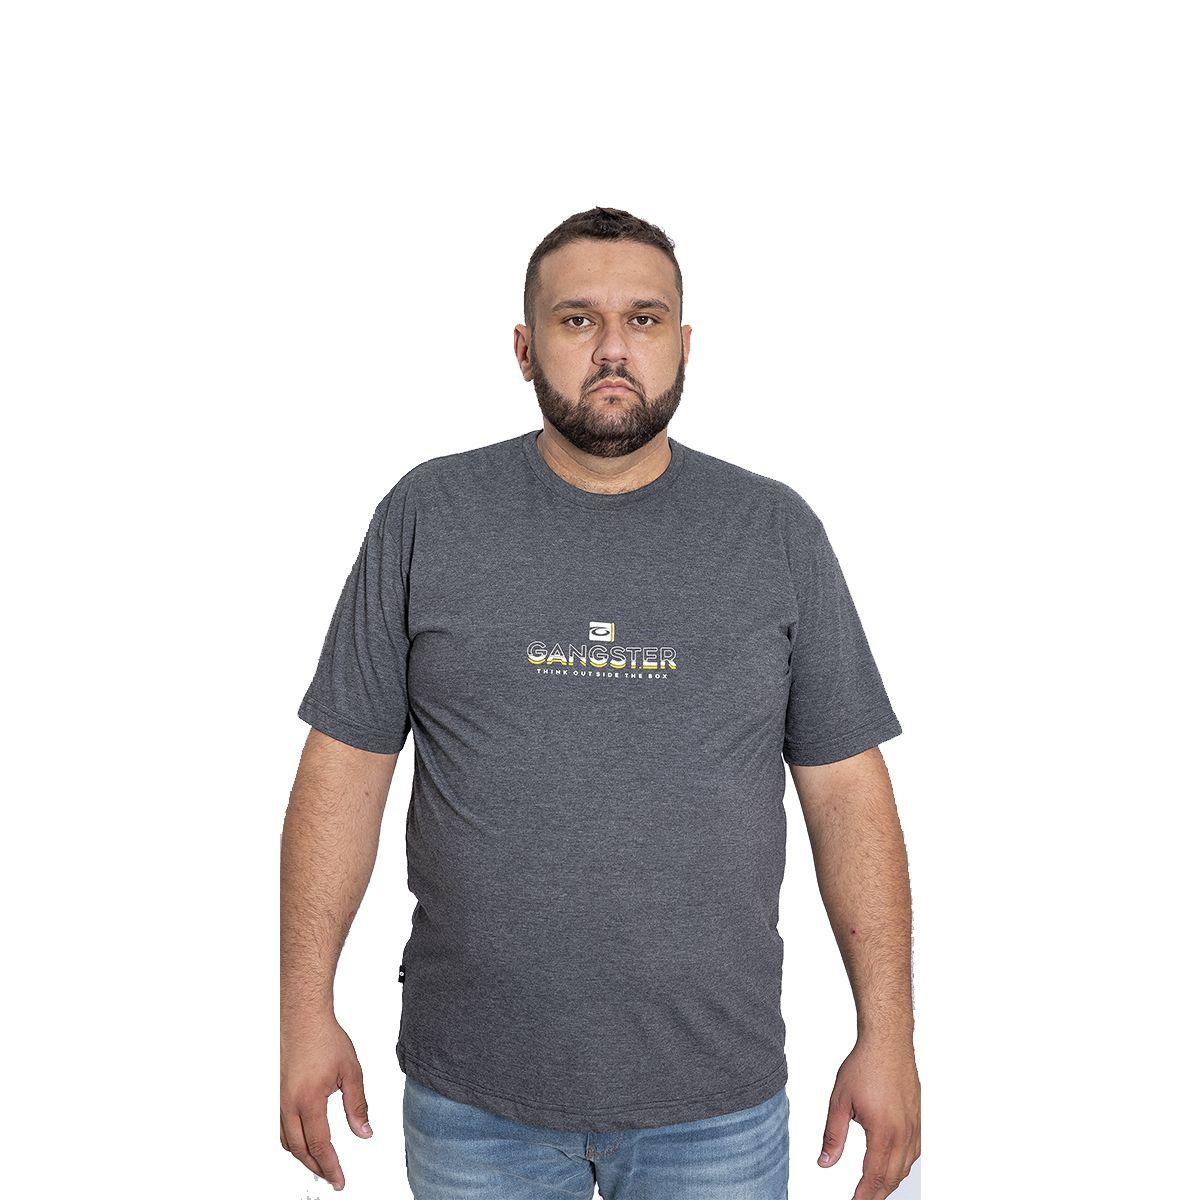 GANGSTER CAMISETA MASC 50.01.1257 COR BRANCO